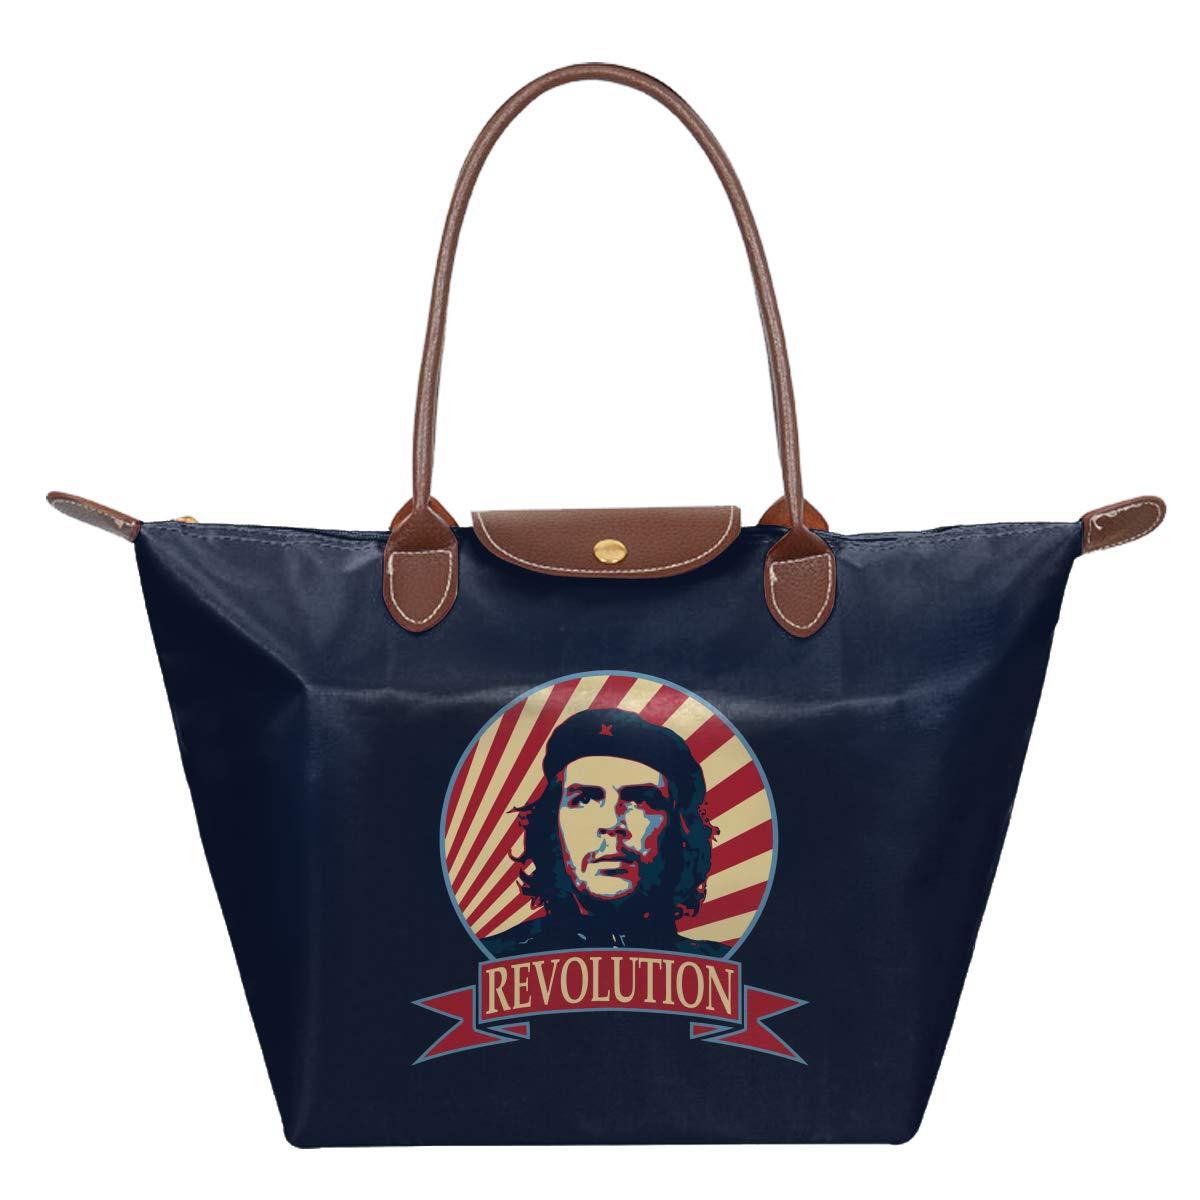 Che Guevara Revolution Waterproof Leather Folded Messenger Nylon Bag Travel Tote Hopping Folding School Handbags